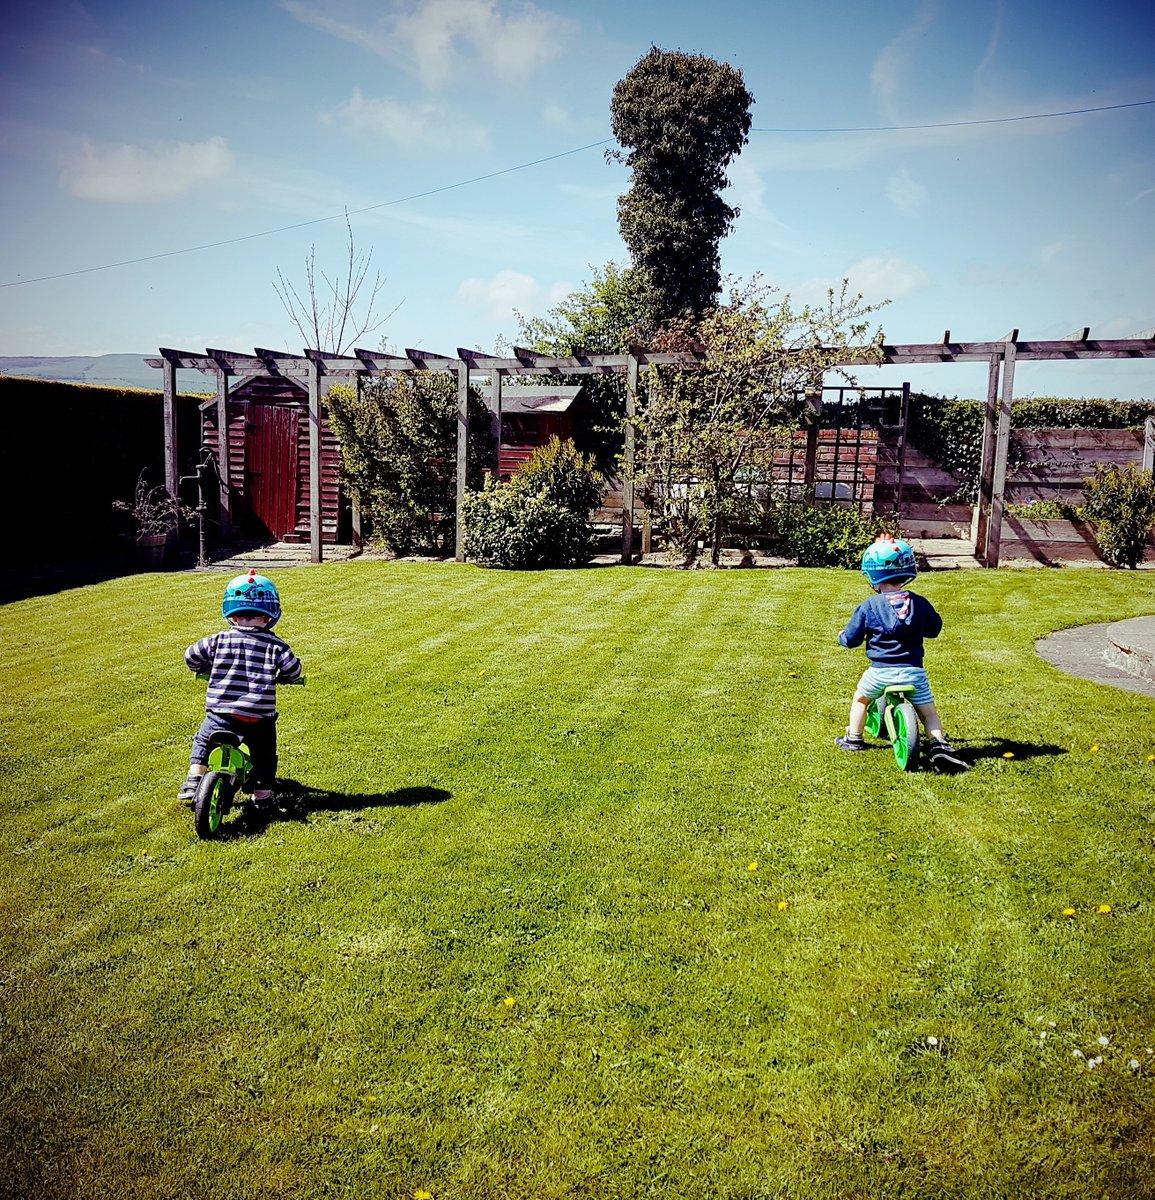 Choosing your child's first bike http://mummyfever.co.uk/choosing-your-childs-first-bike/… #balancebike #bikes #firstbike #outdoorplaypic.twitter.com/4G58Kjwh6d